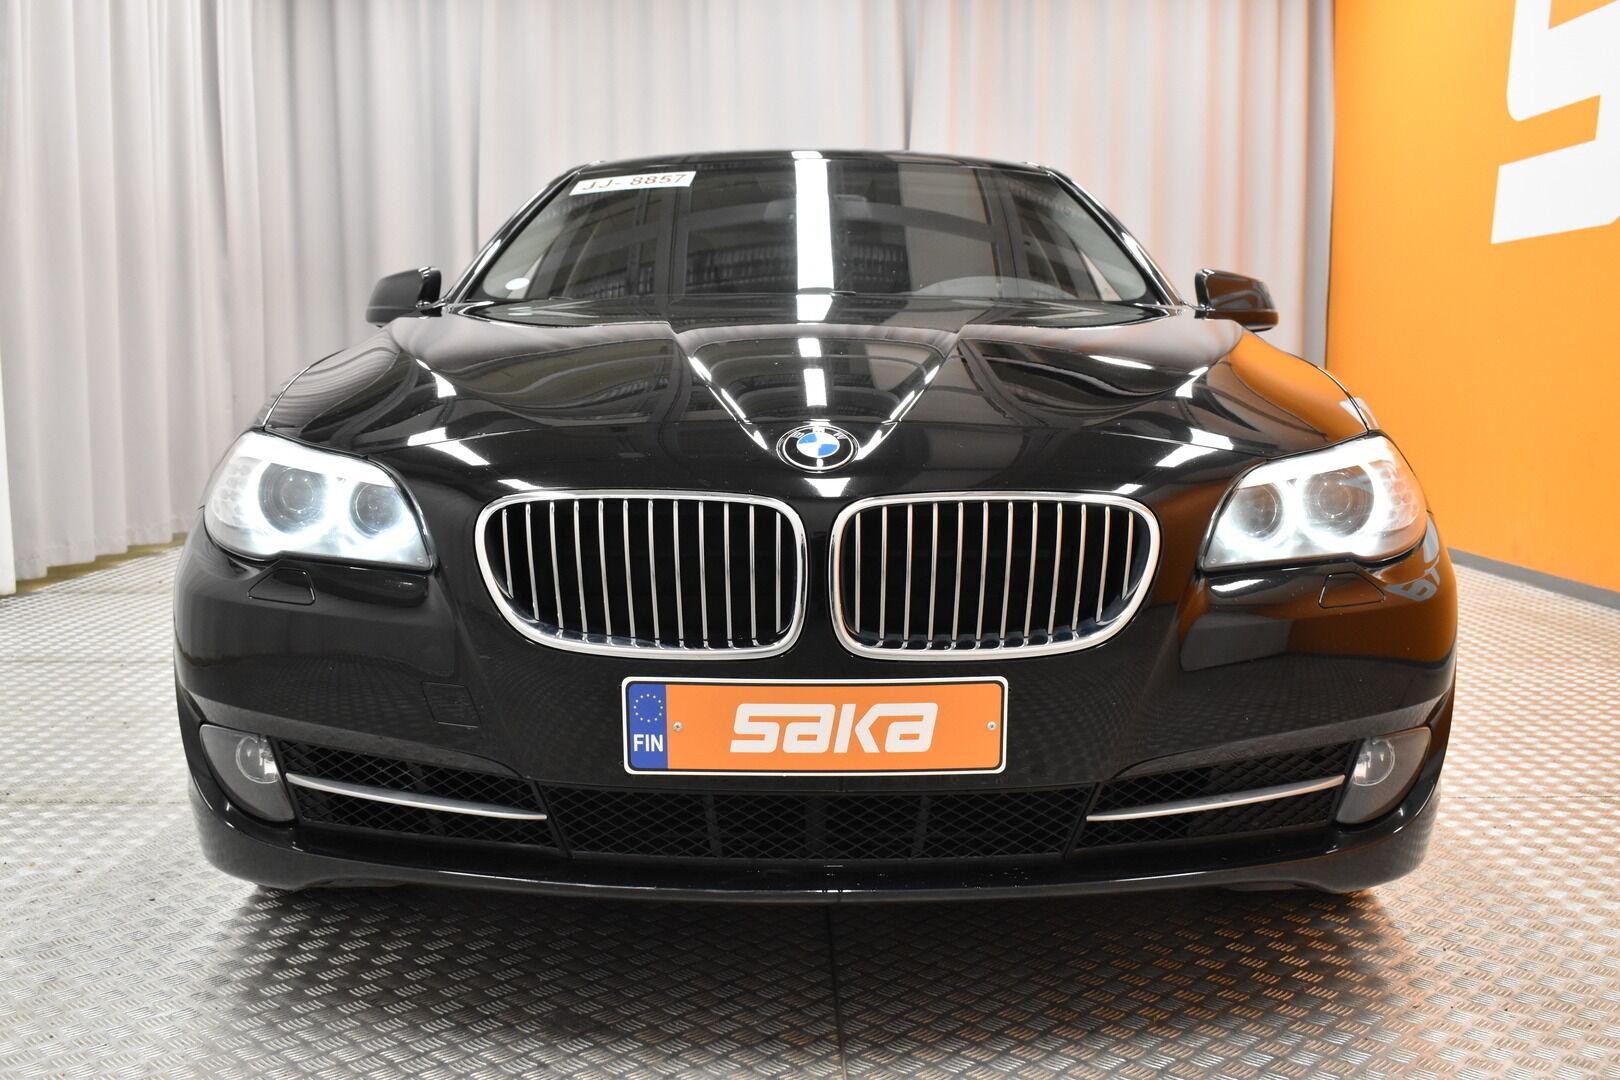 Musta Sedan, BMW 528 – POR-8128, kuva 7